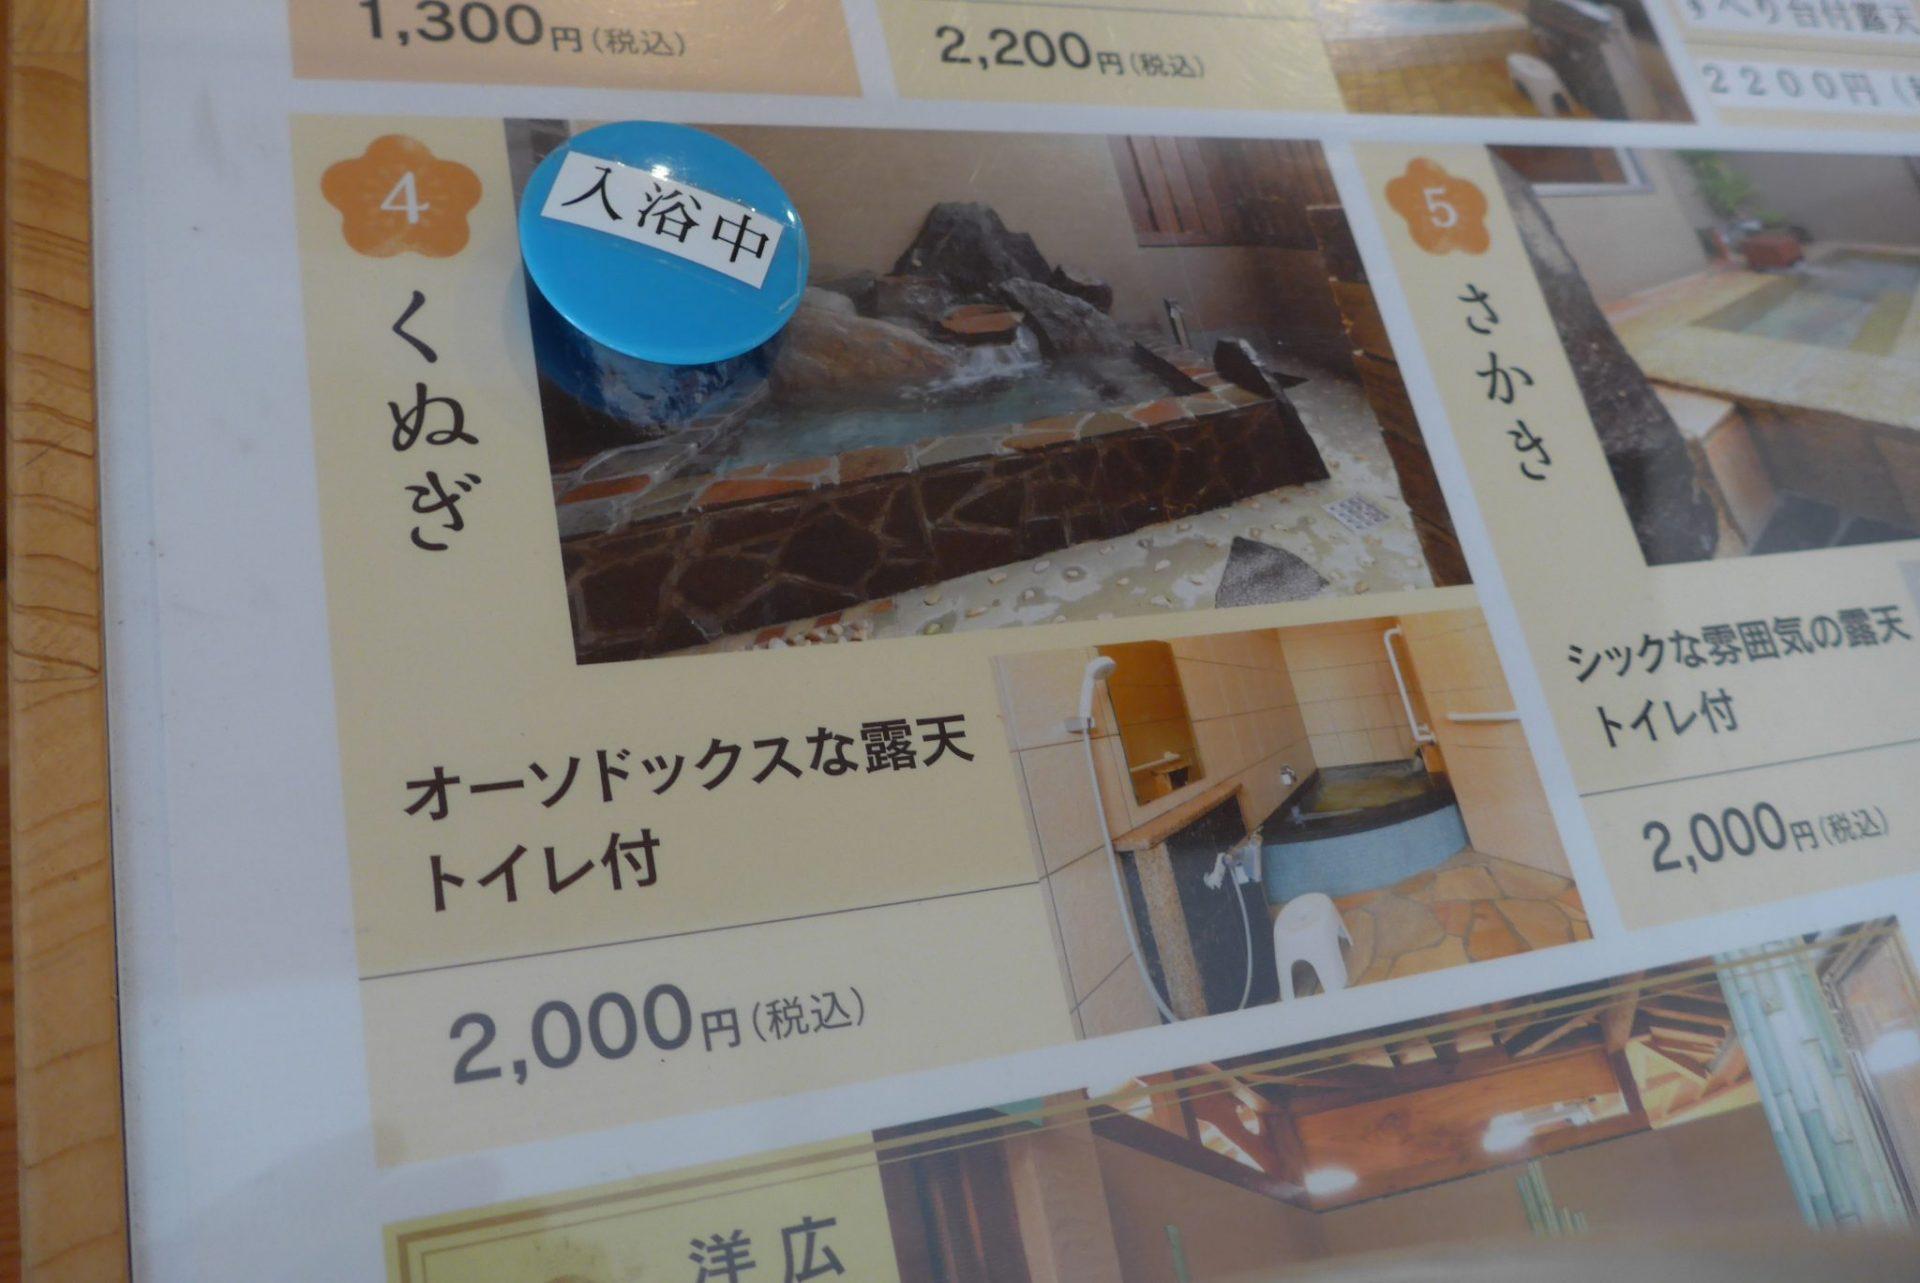 (K)玉名温泉湯願の家族風呂〜コロナ対策シッカリの日帰り入浴